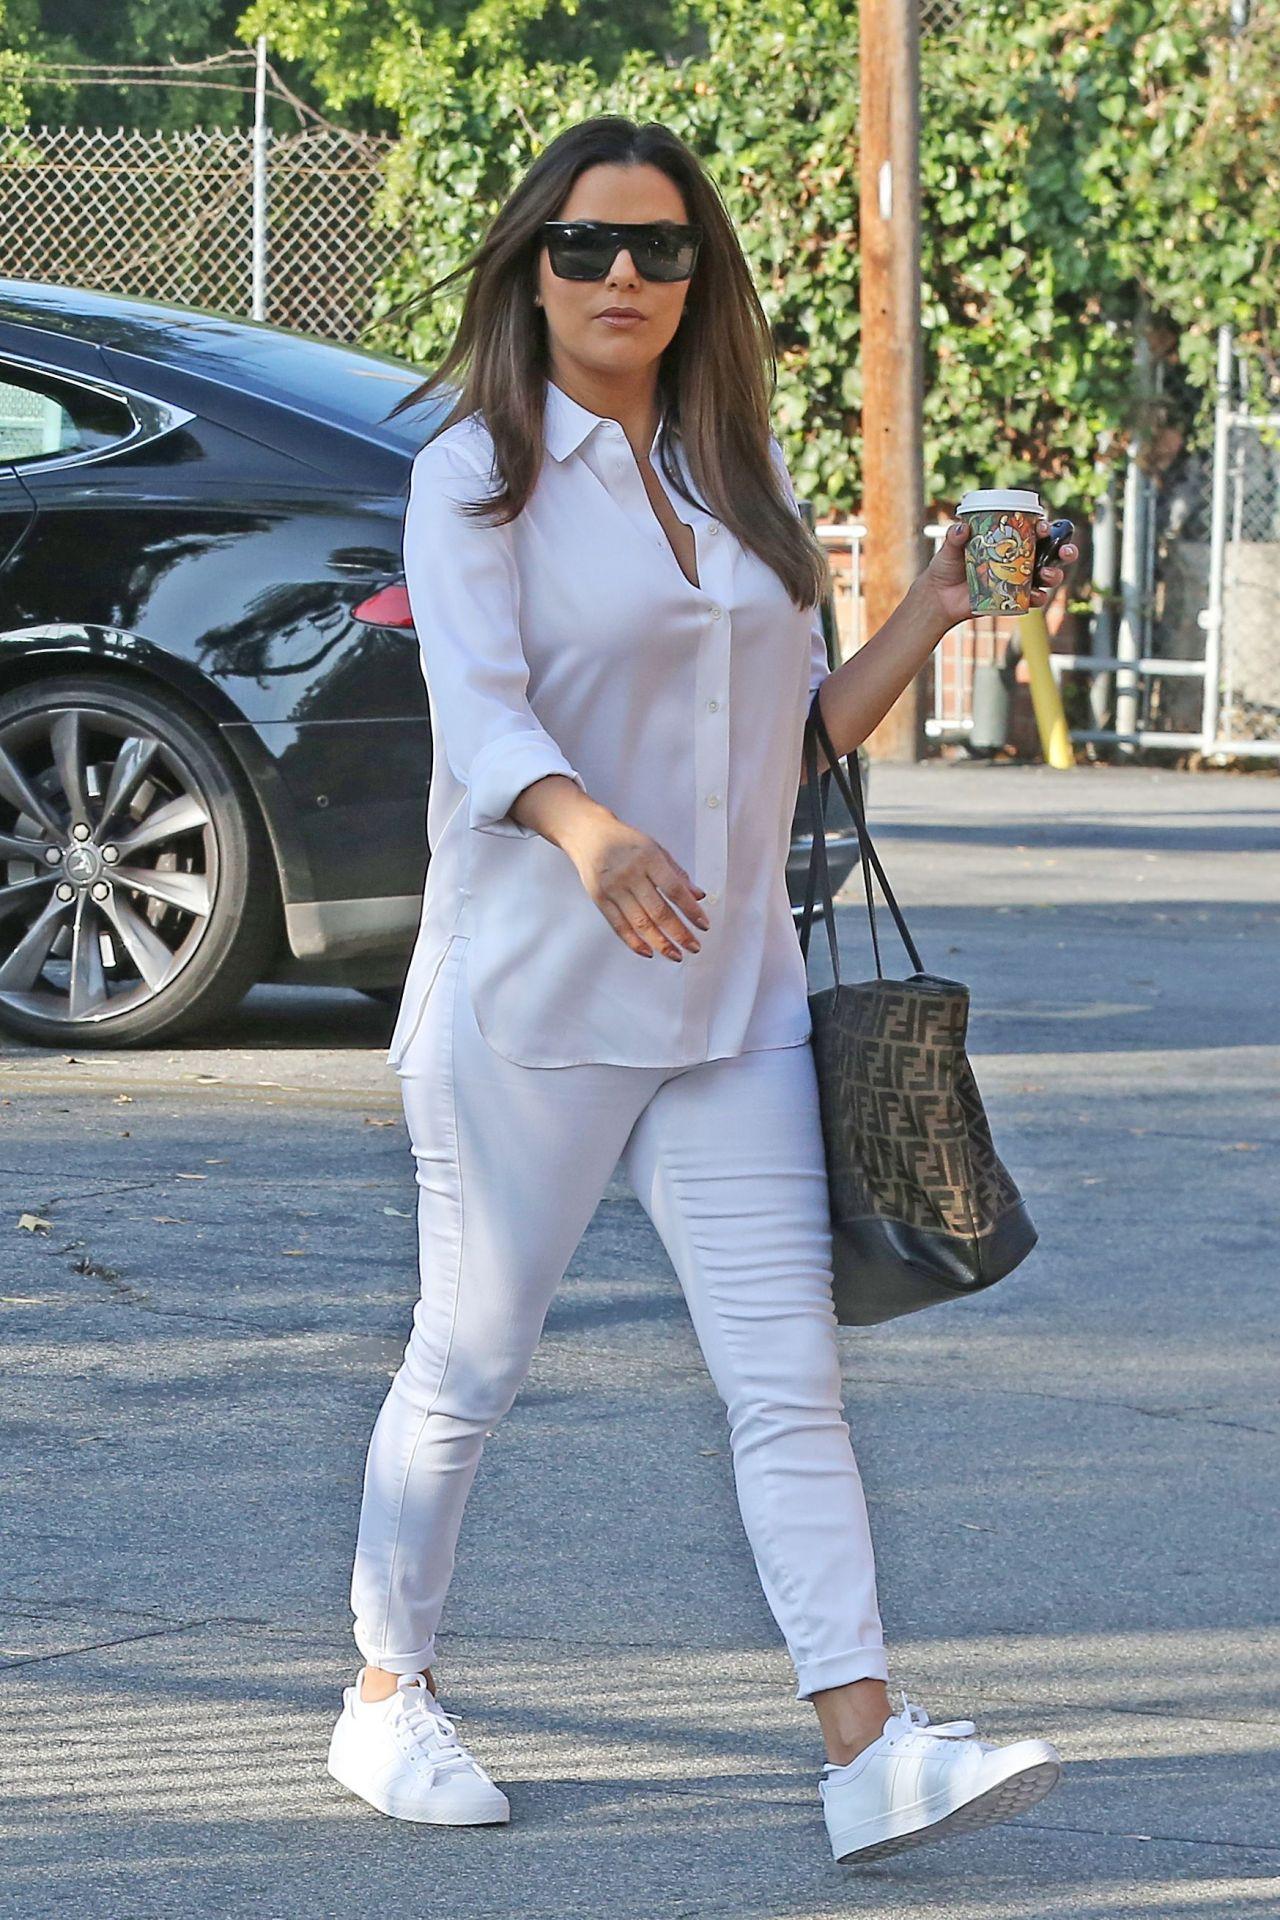 https://celebmafia.com/wp-content/uploads/2018/10/eva-longoria-in-a-stylish-all-white-outfit-out-in-la-10-24-2018-5.jpg